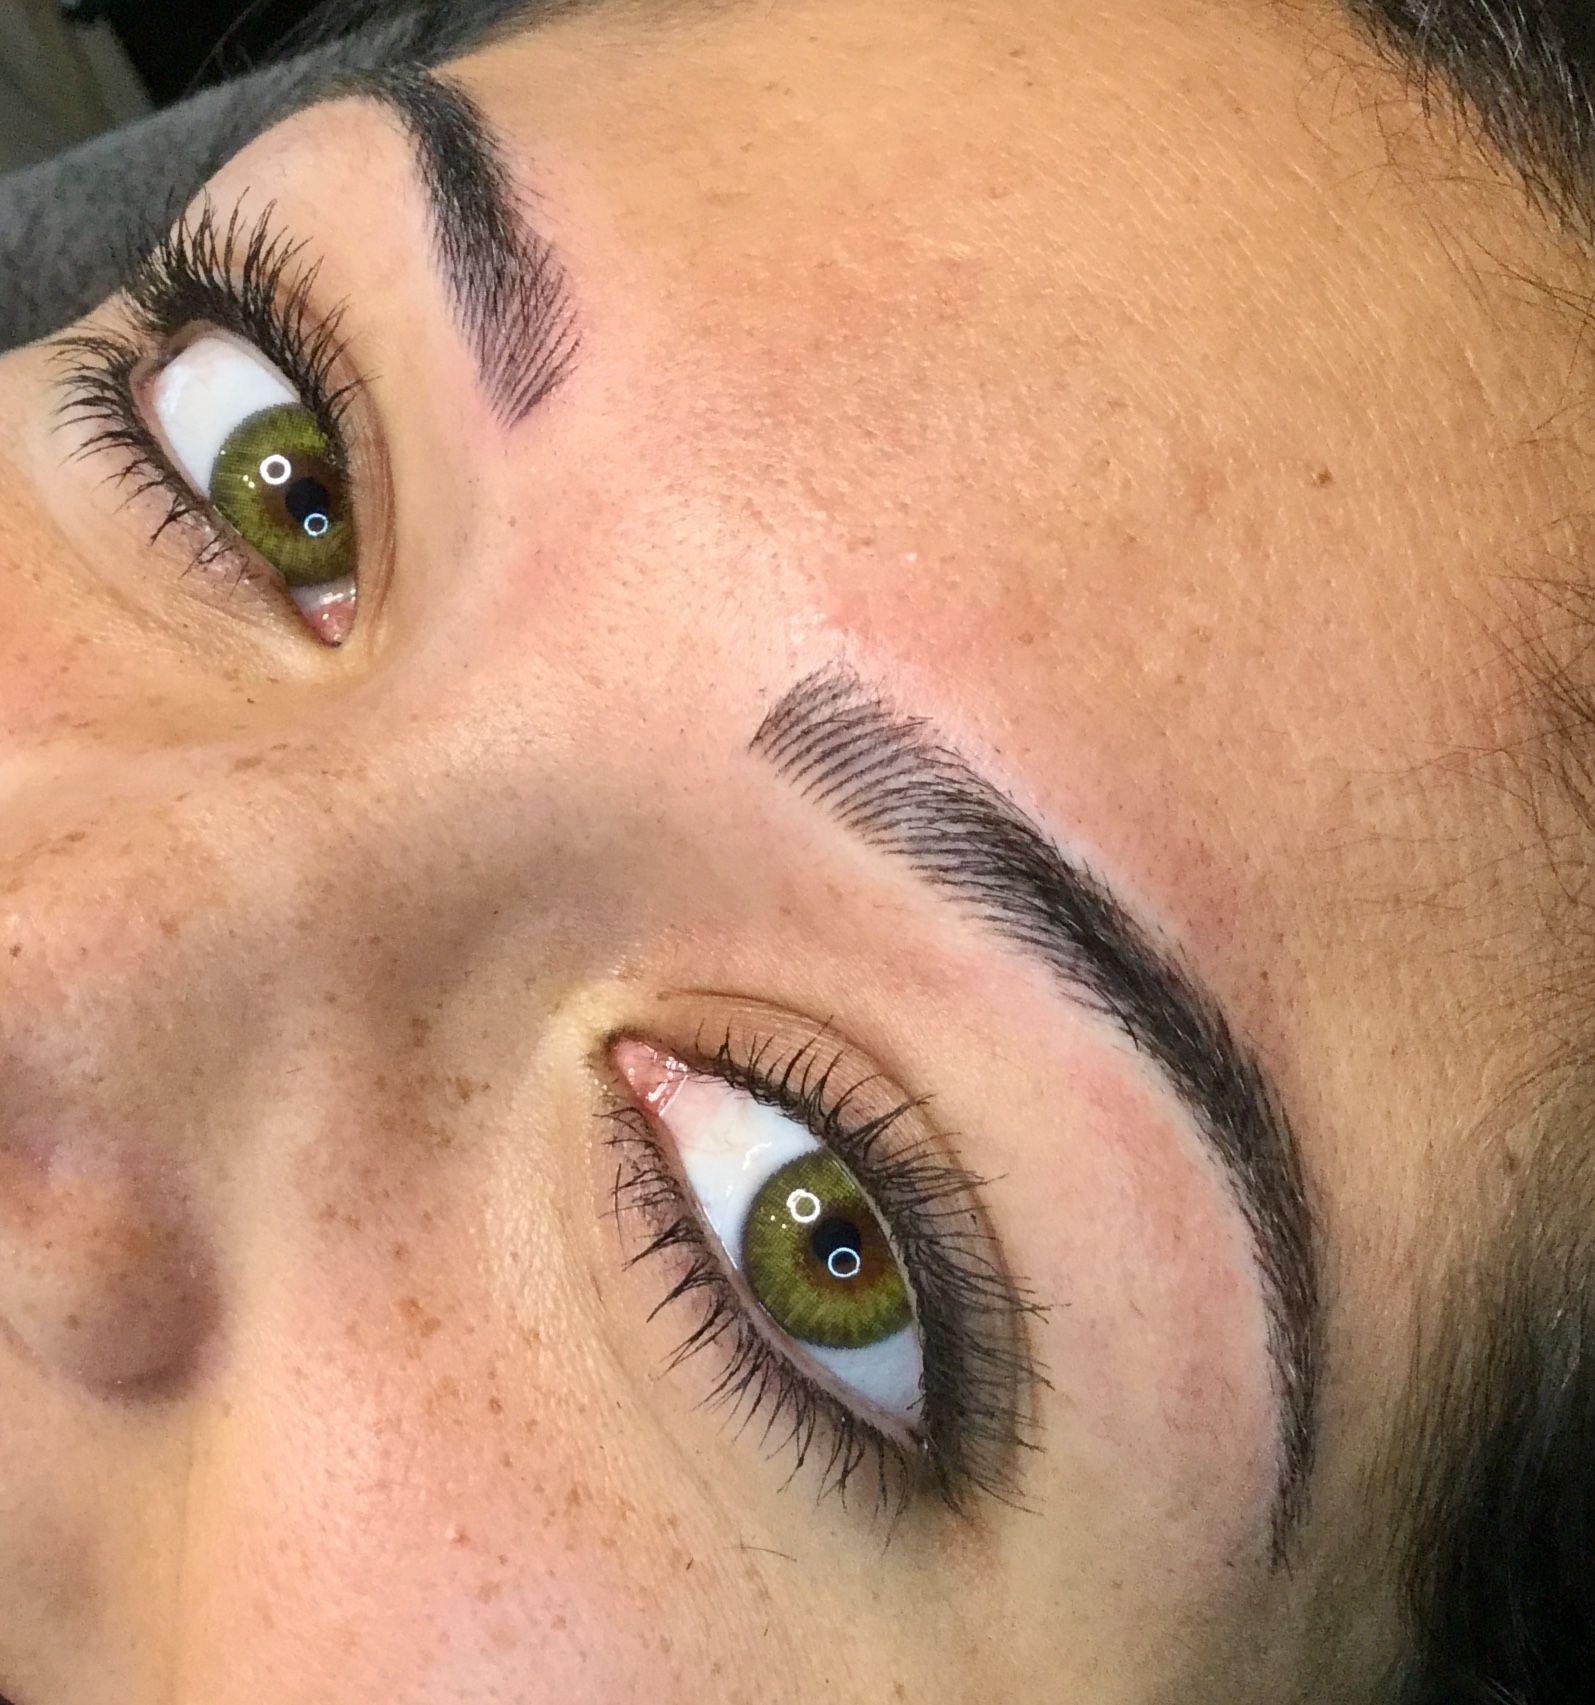 Pin on Permanent makeup